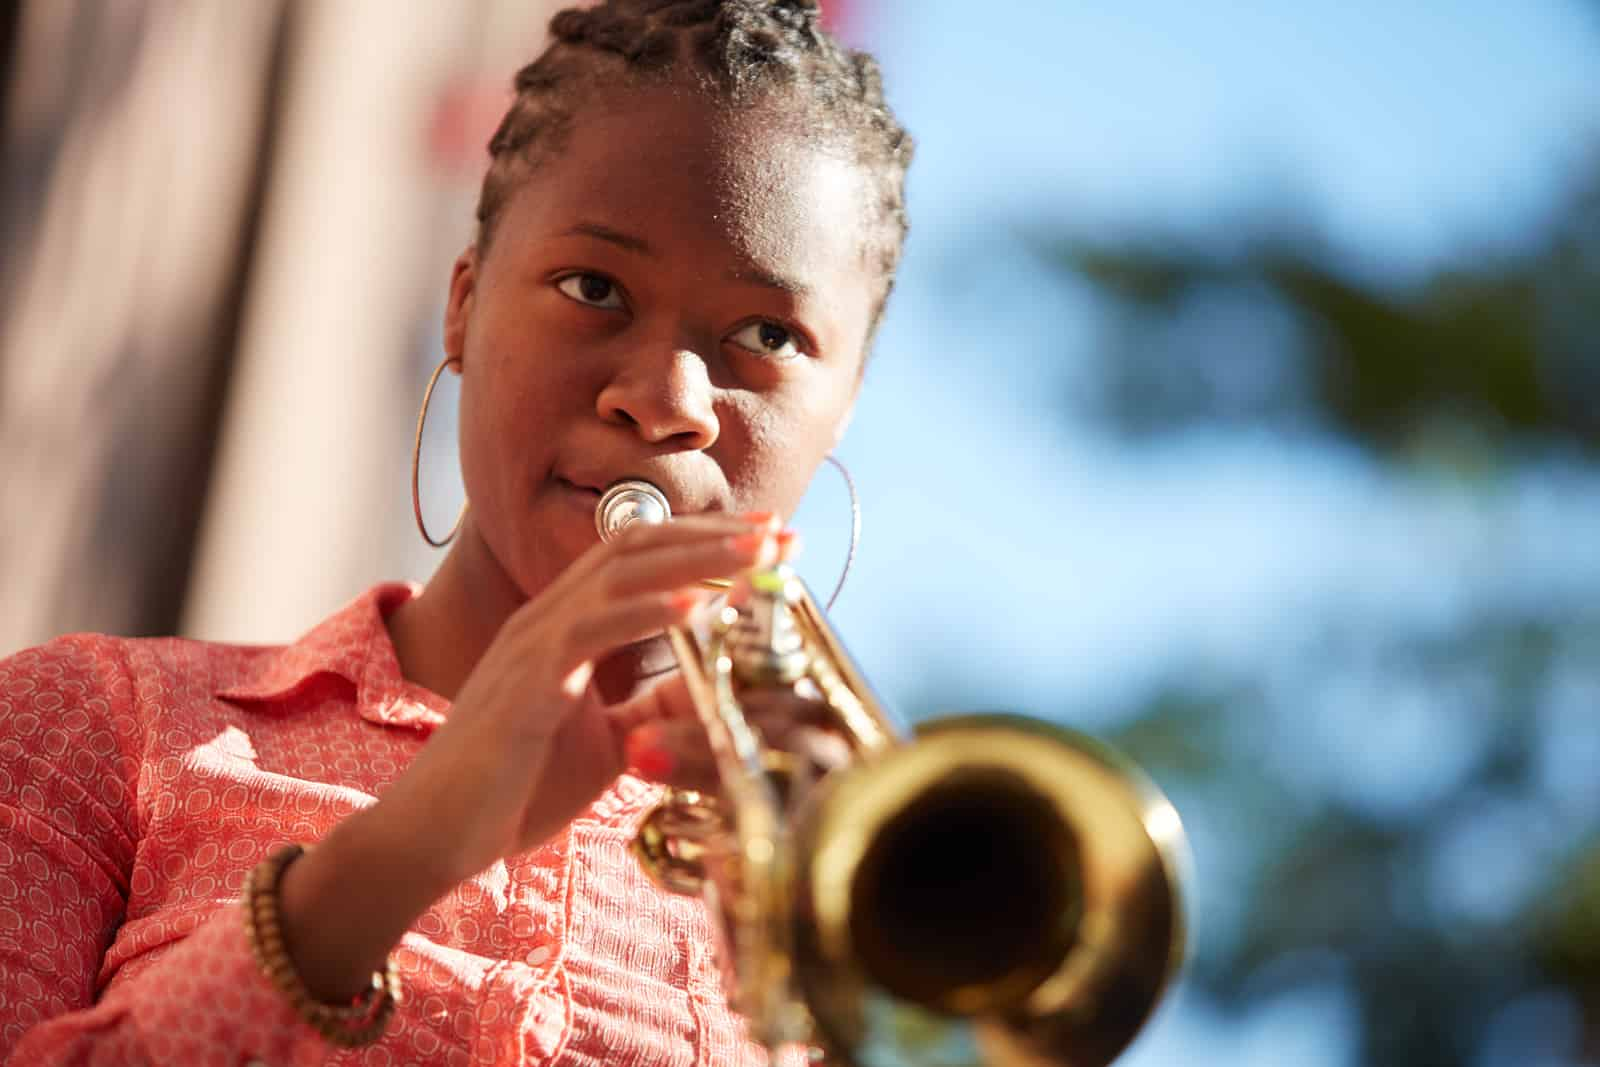 trumpet injuries